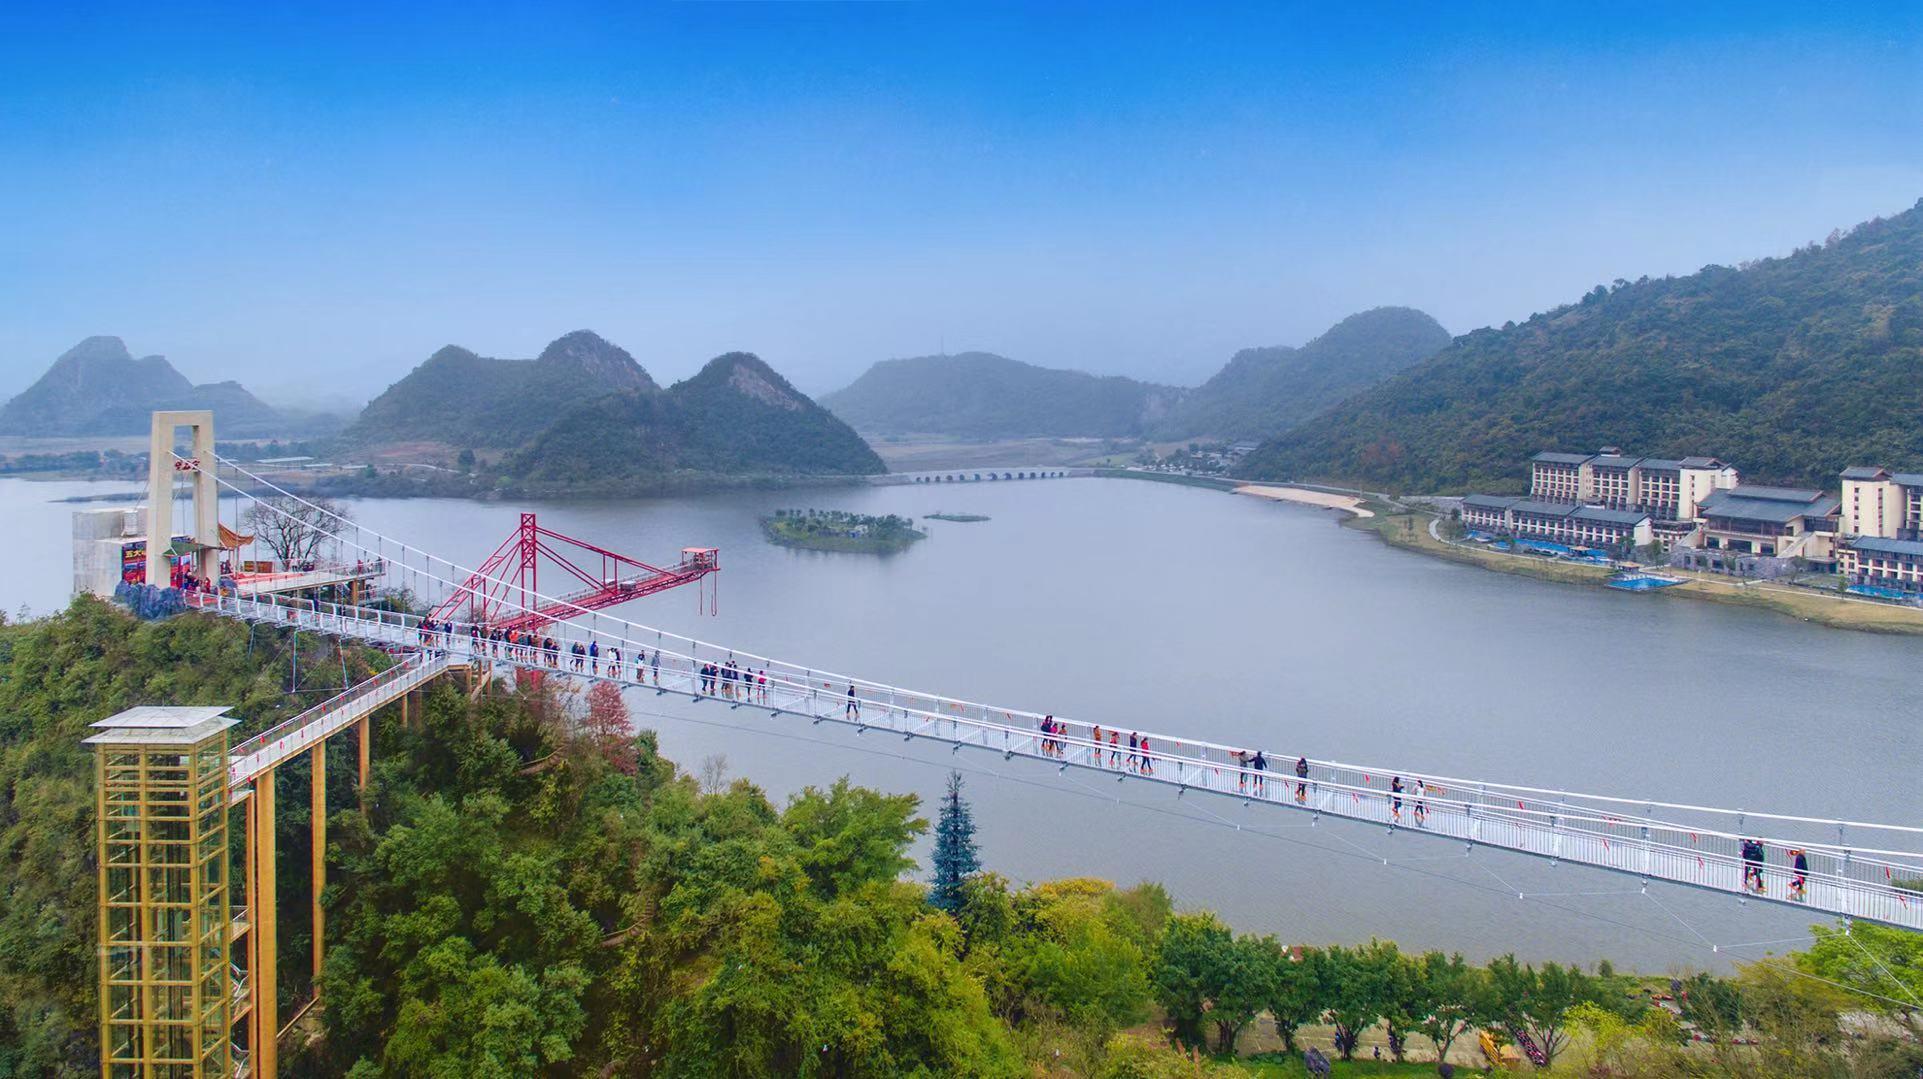 Baojing Palace Cave + Glass Bridge + Sky Lift Ticket